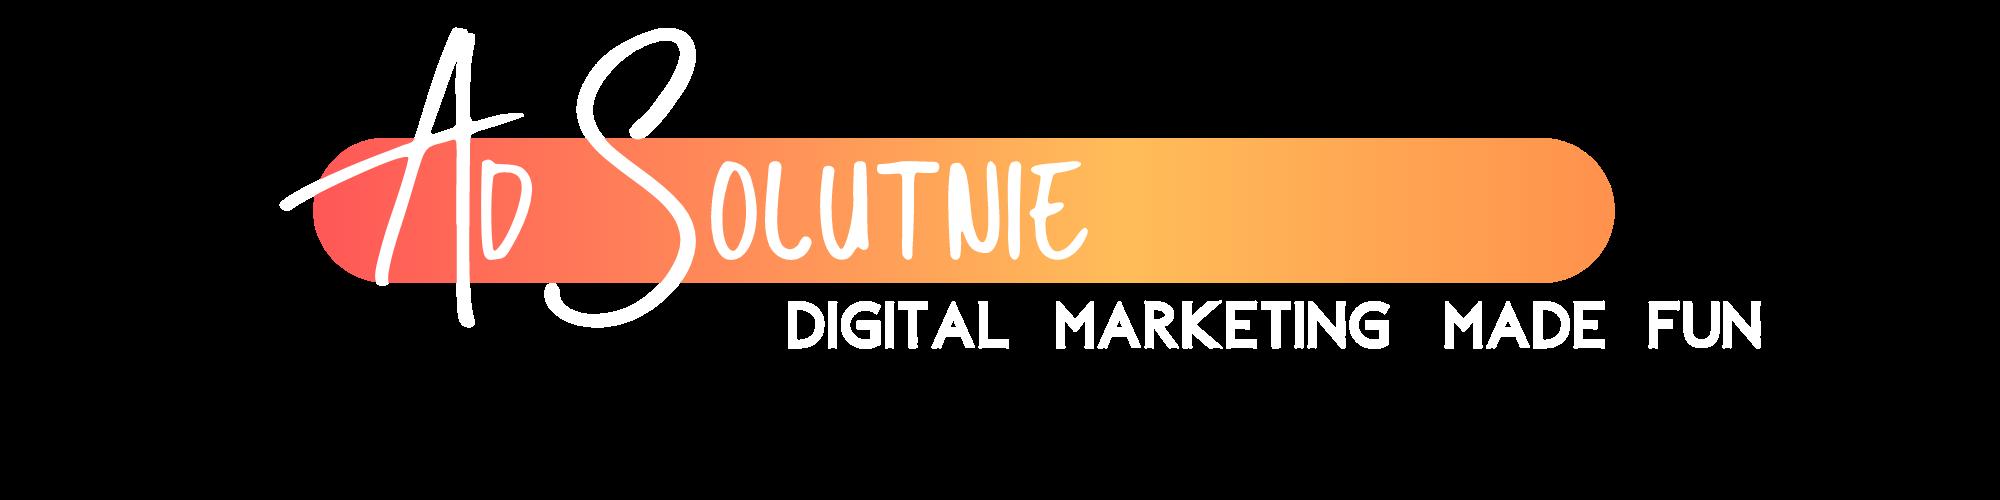 Adsolutnie - Digital Marketing Agency